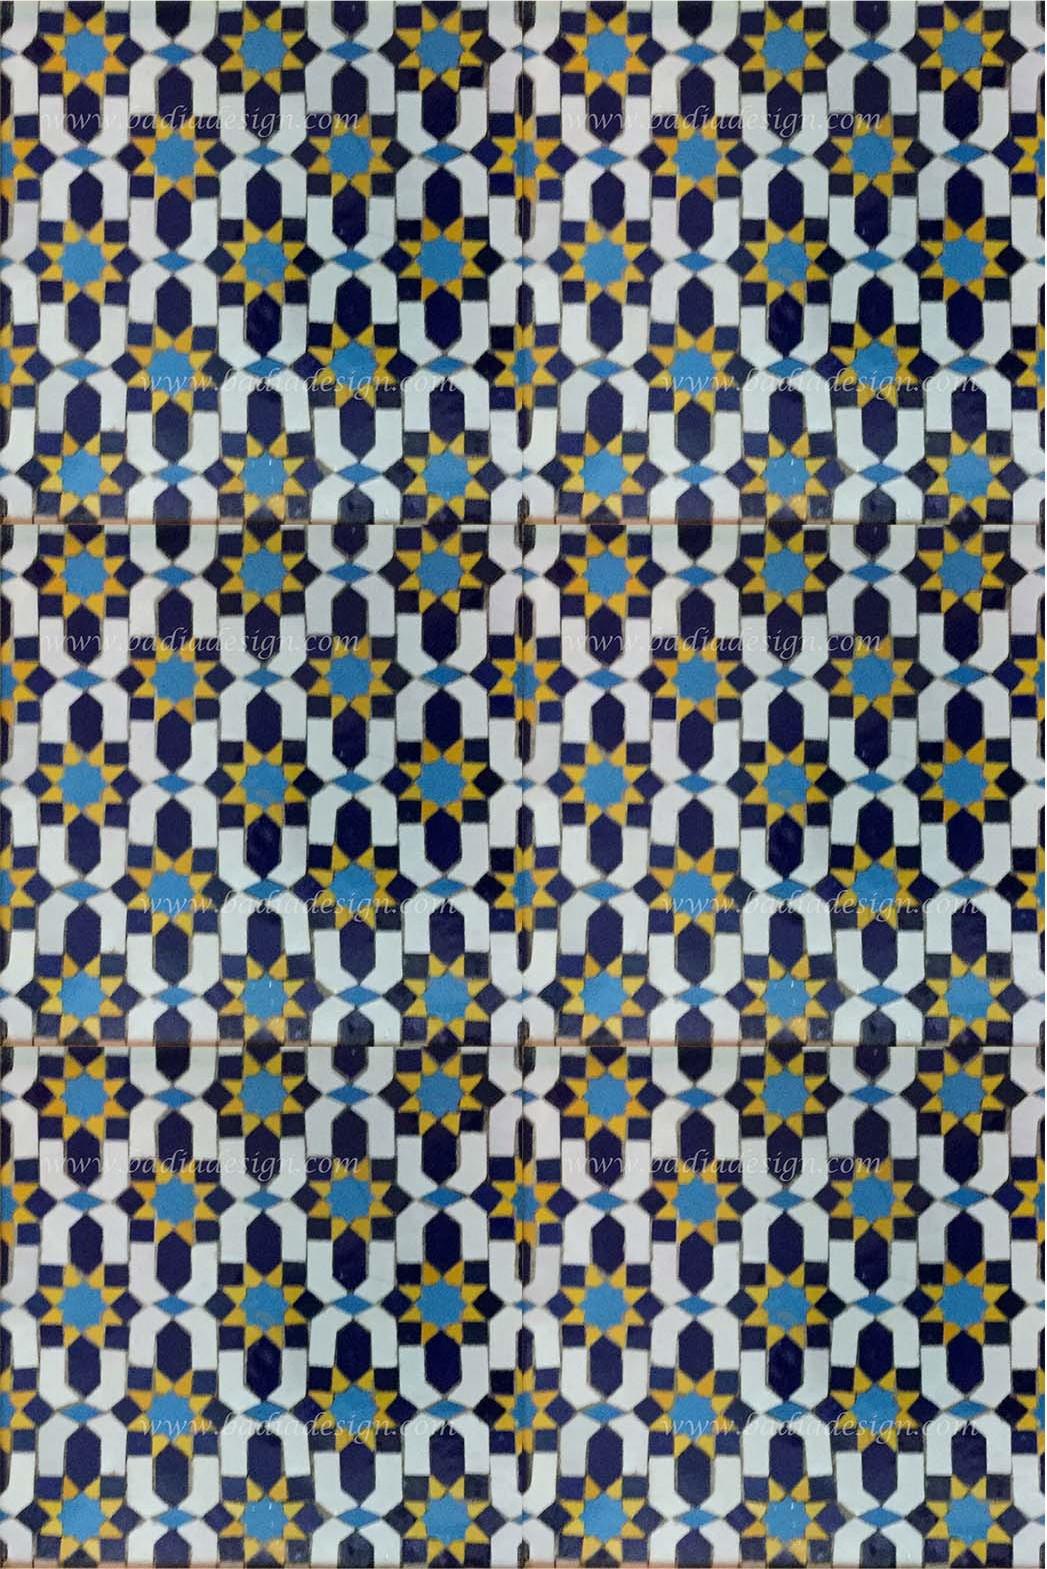 moroccan-mosaic-tile-tm051-2a.jpg